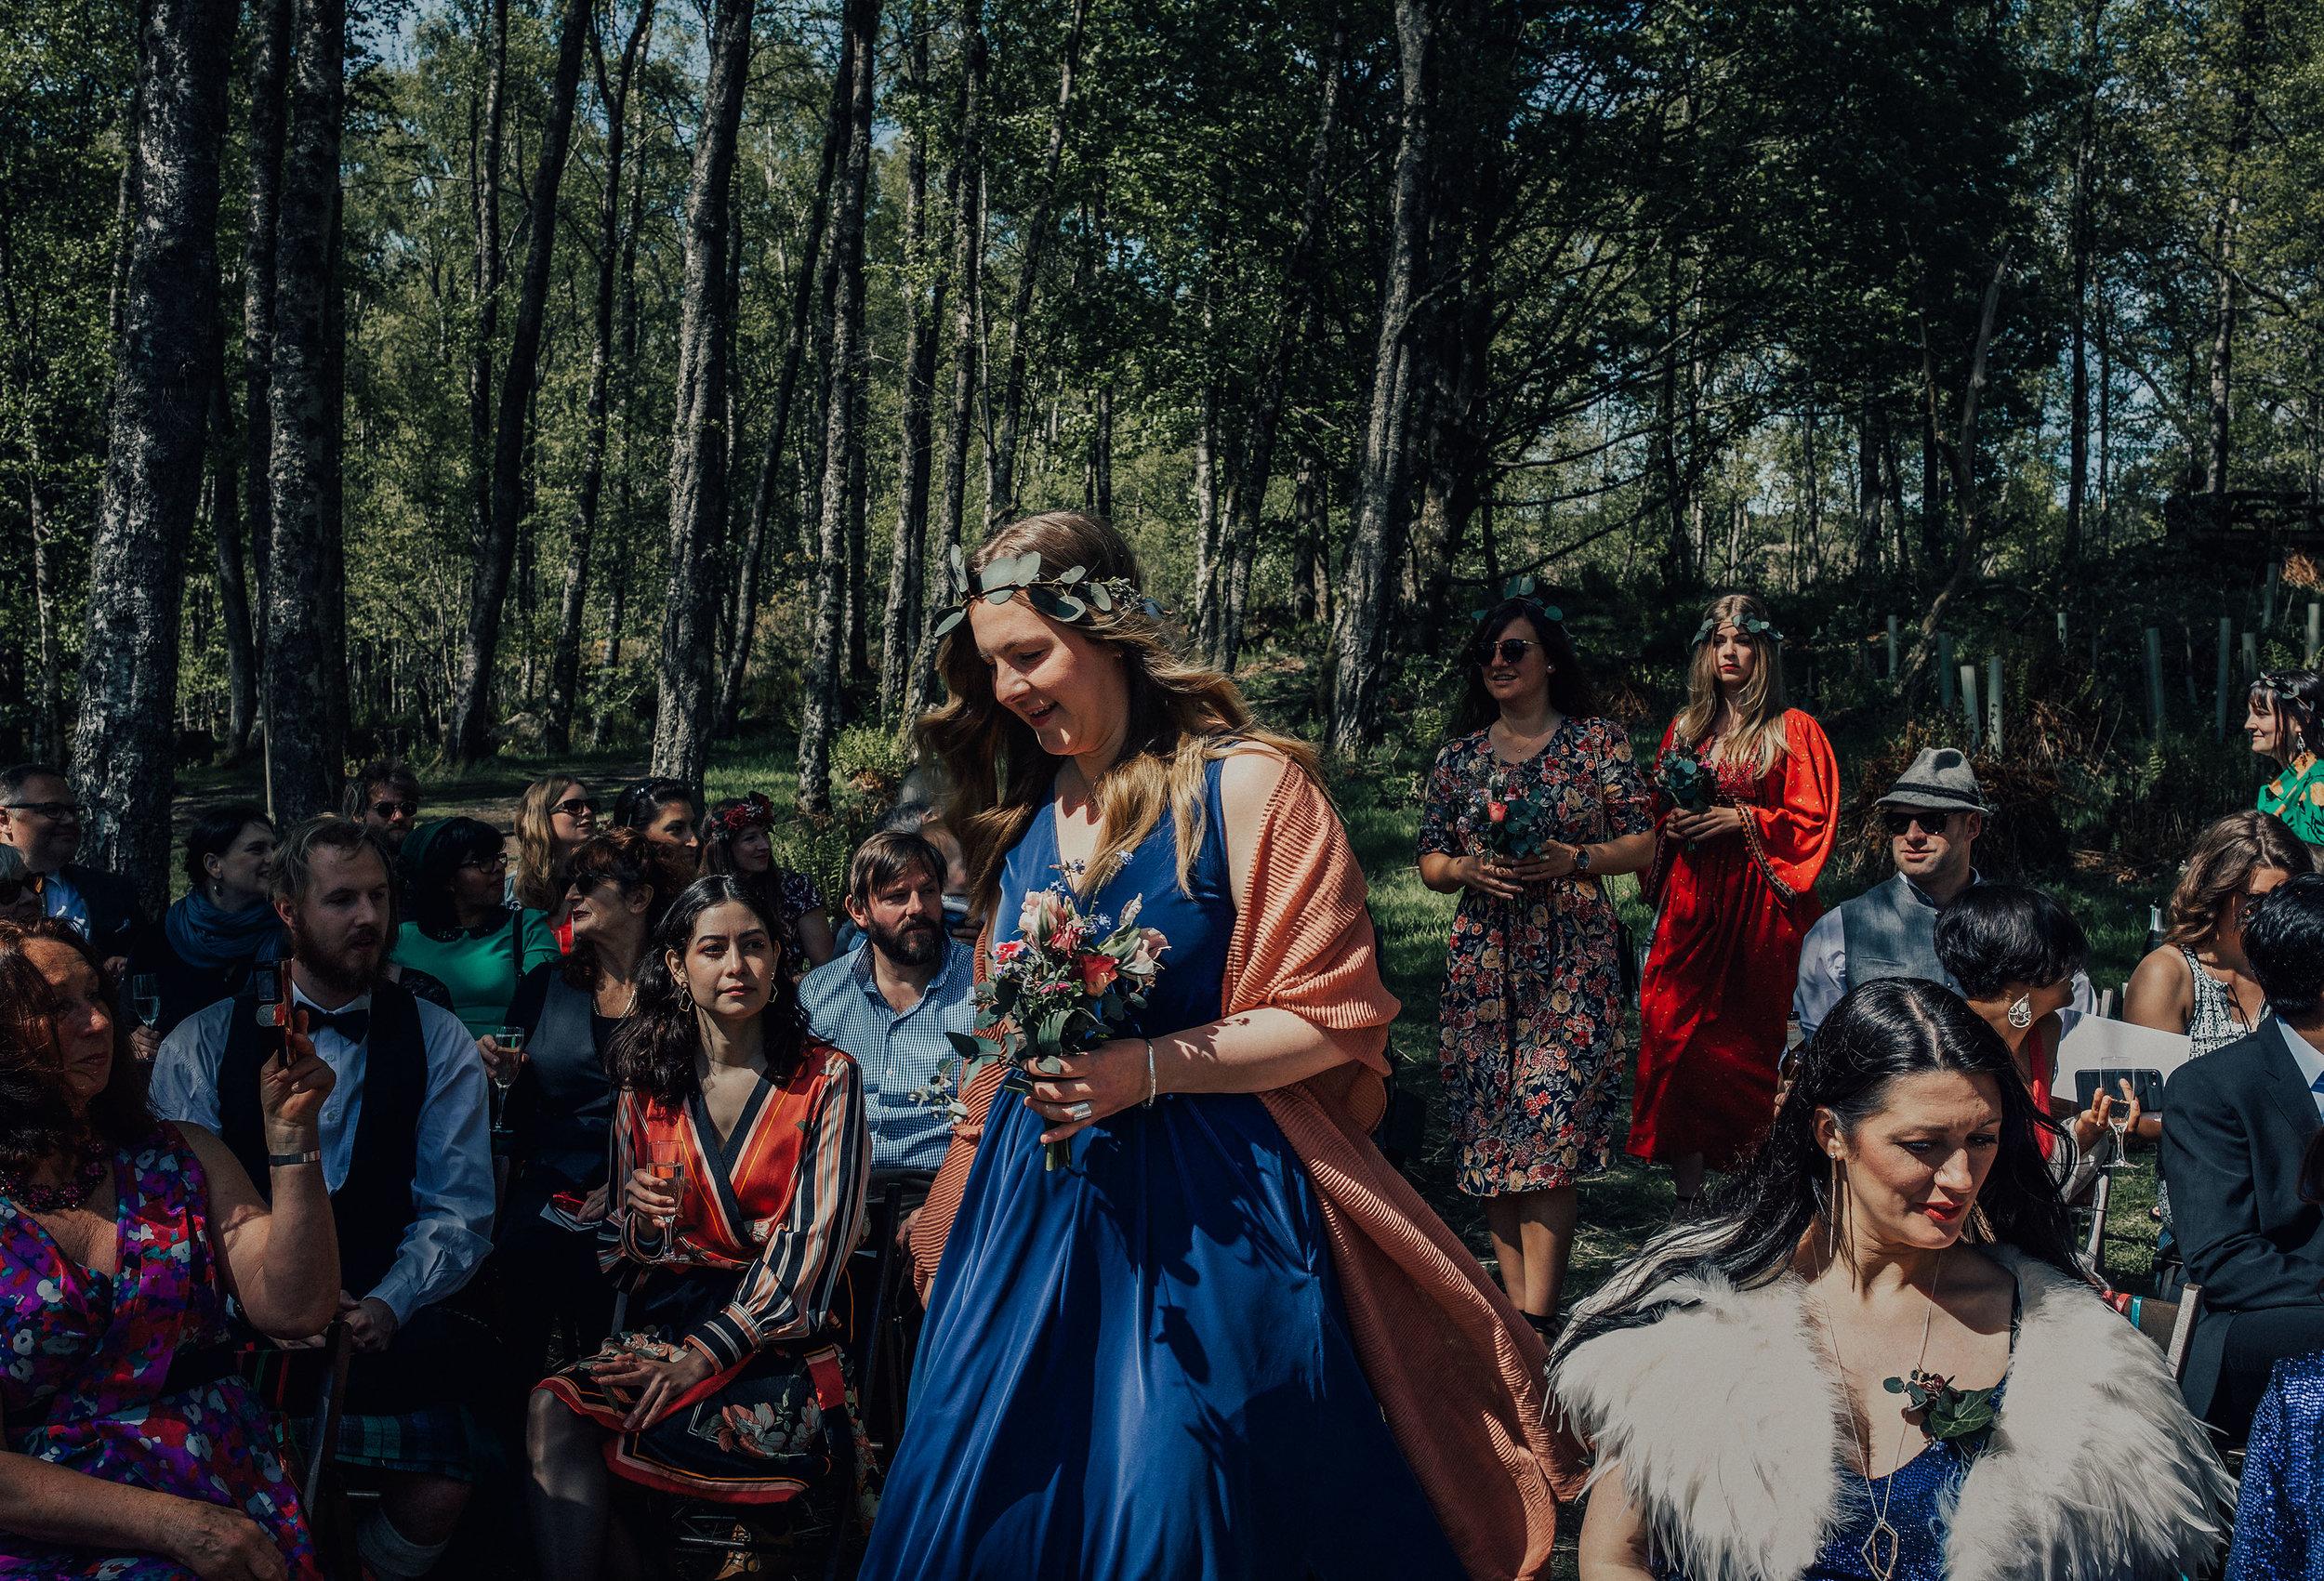 COMRIE_CROFT_WEDDINGS_PJ_PHILLIPS_PHOTOGRAPHY_55.jpg